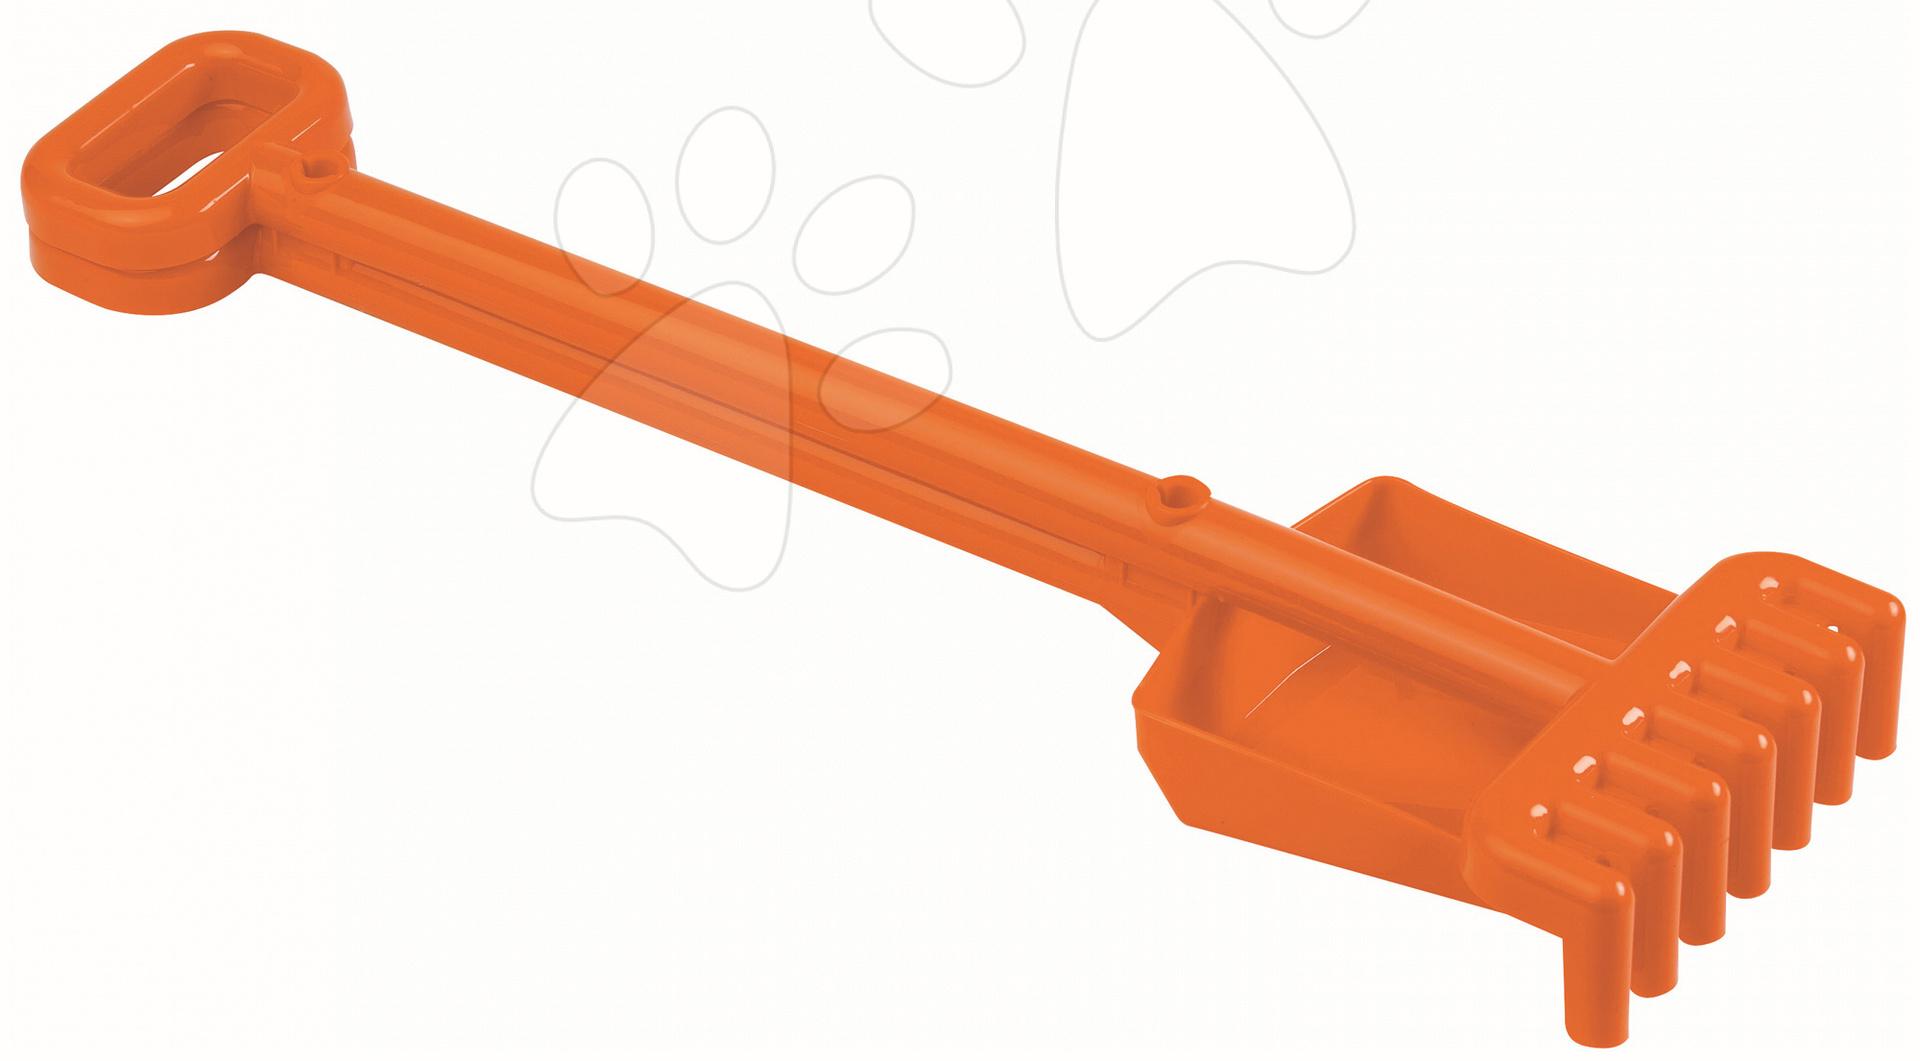 Lopatky do piesku - Sada lopatka a hrabličky Écoiffier (dĺžka 52 cm) oranžová od 18 mes